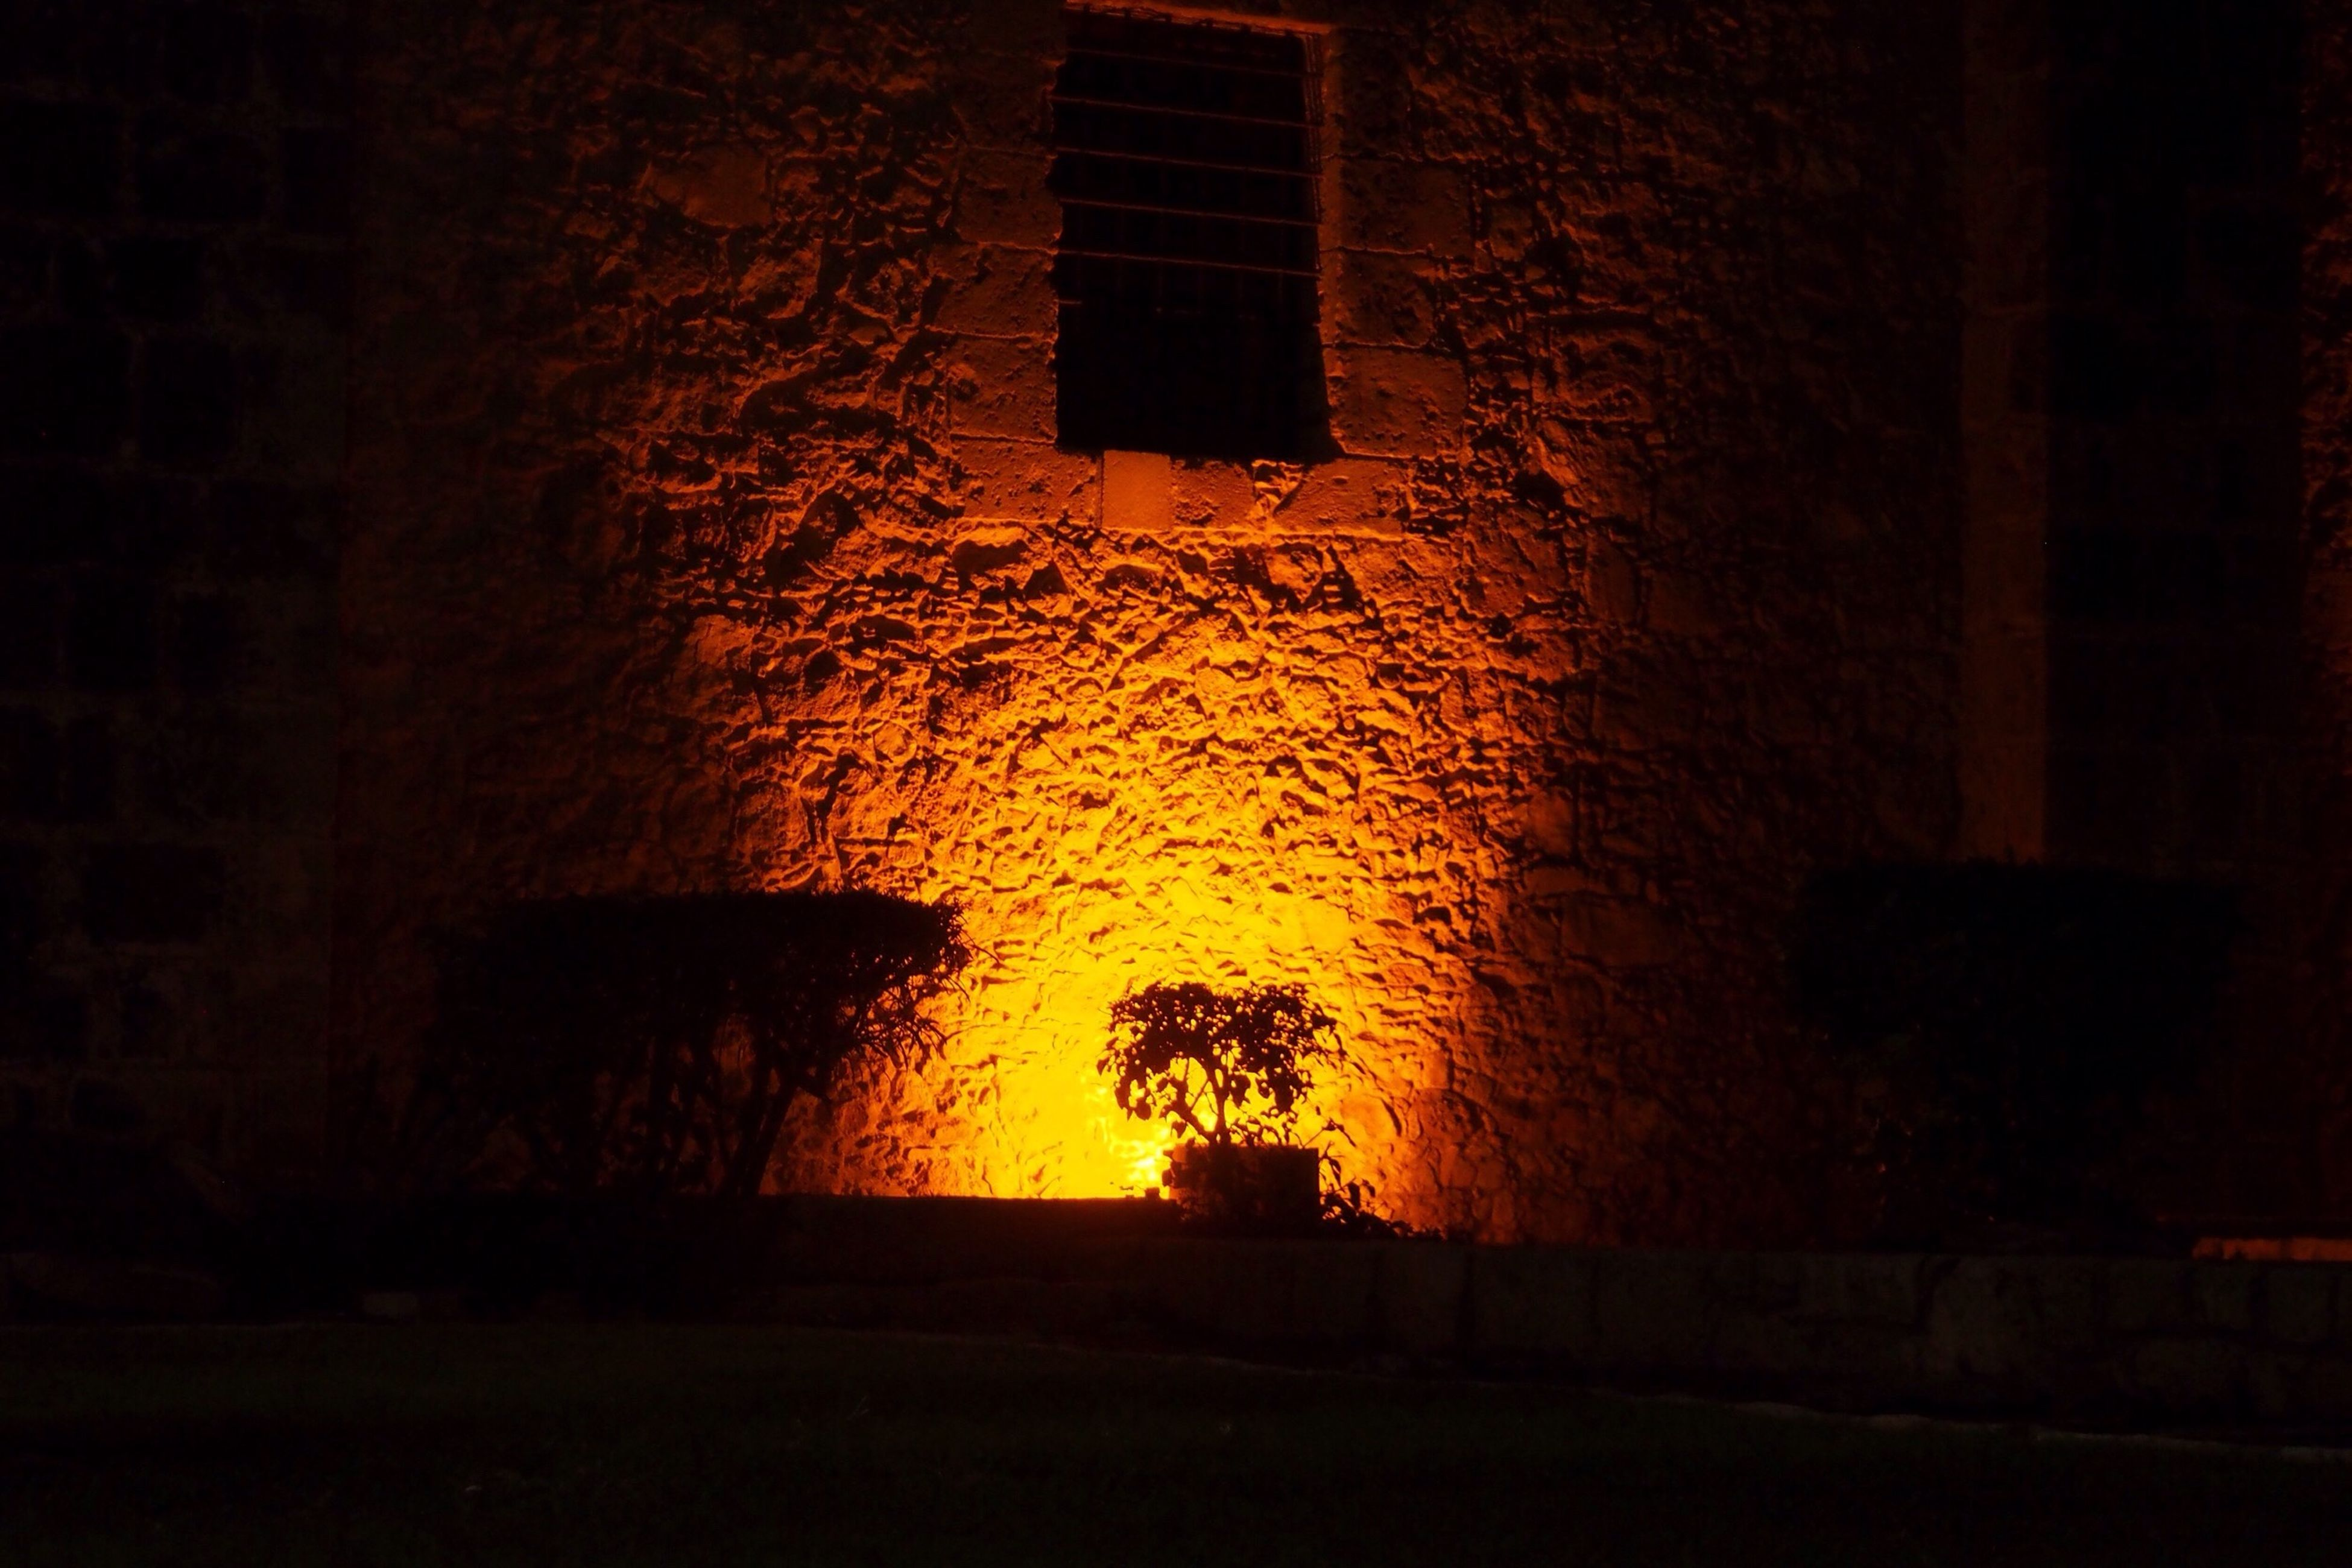 architecture, night, built structure, building exterior, no people, indoors, illuminated, prison